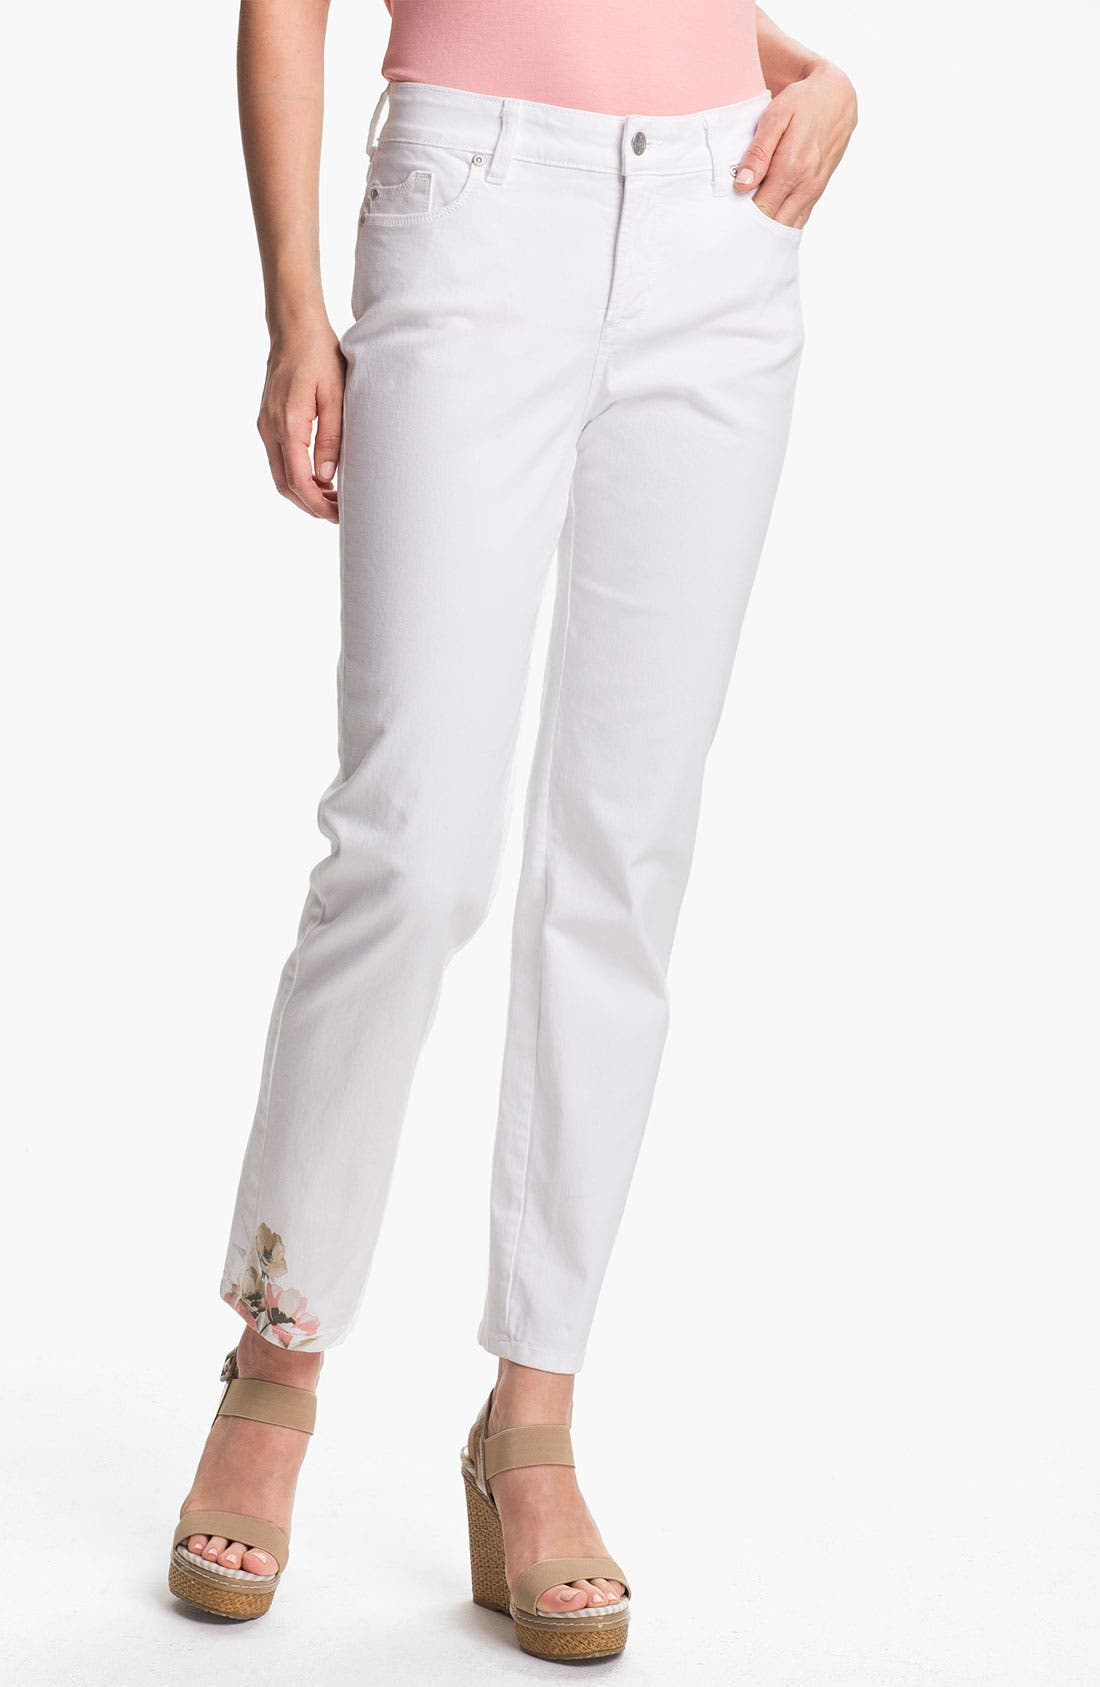 Main Image - NYDJ 'Alisha - Placed Print' Skinny Stretch Ankle Jeans